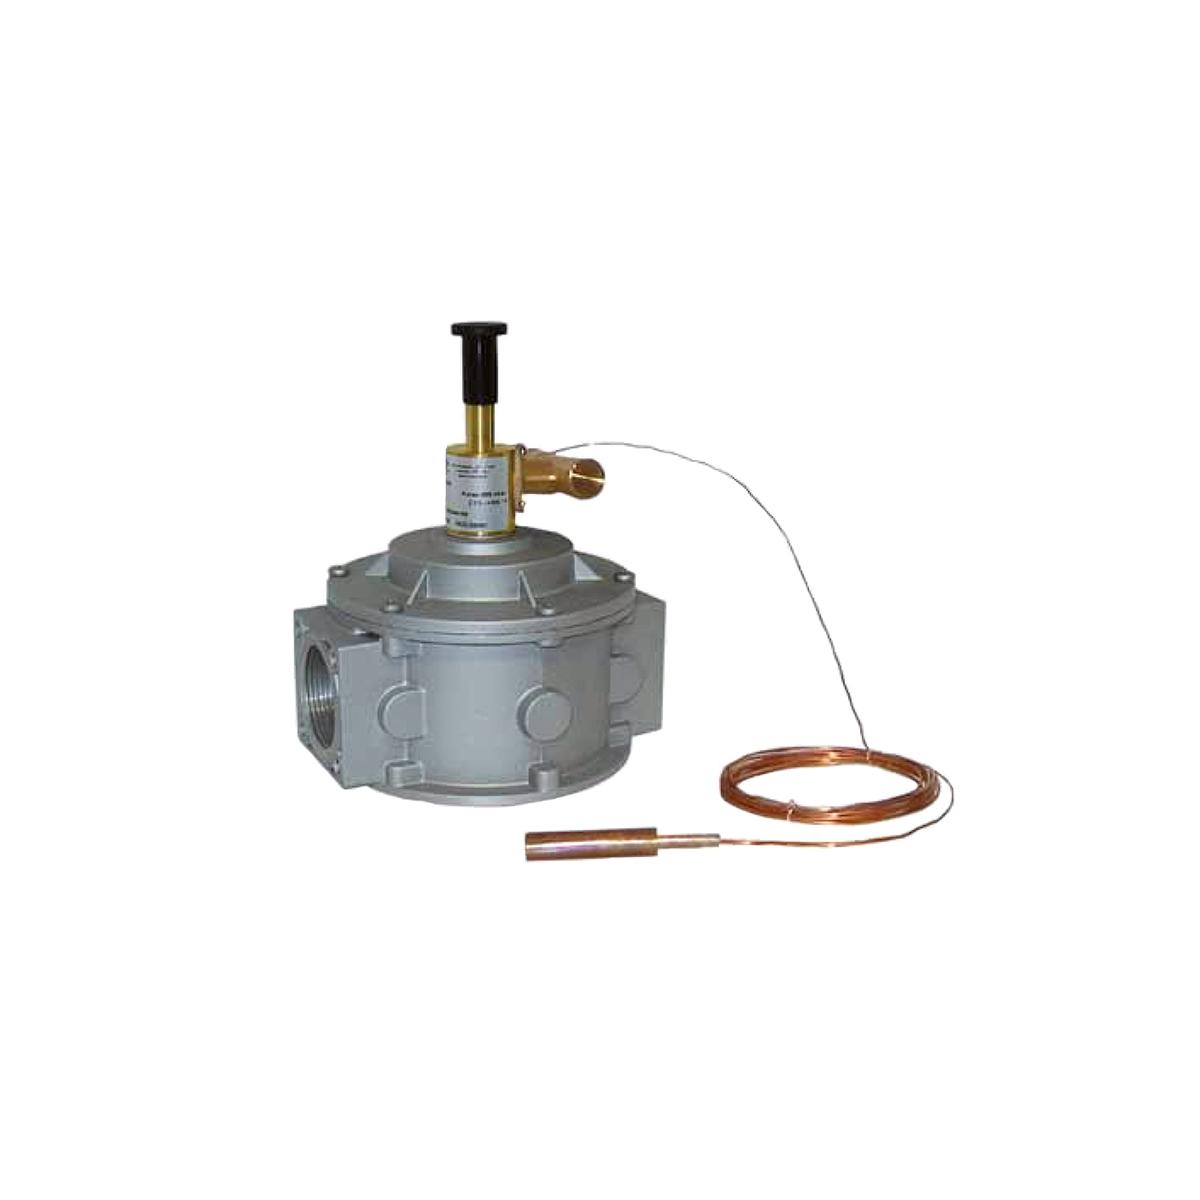 Liquid and gaseous fuel interception valve